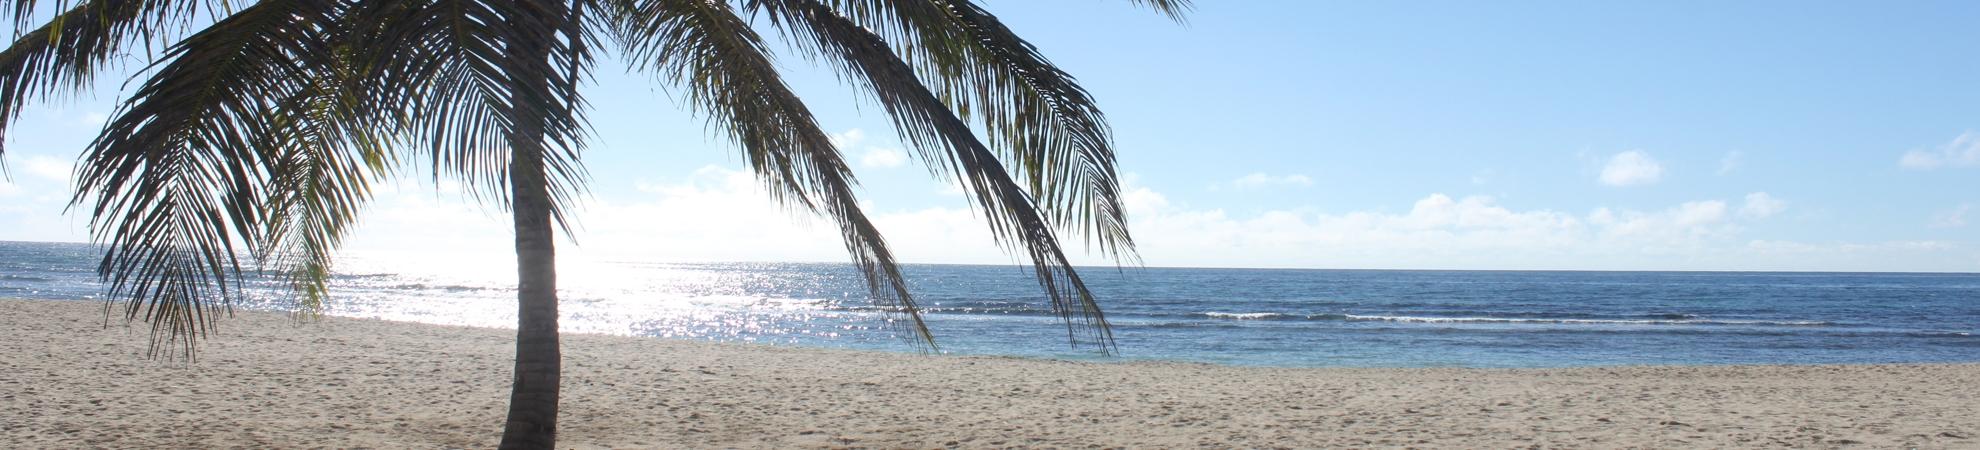 Voyage Boca Chica